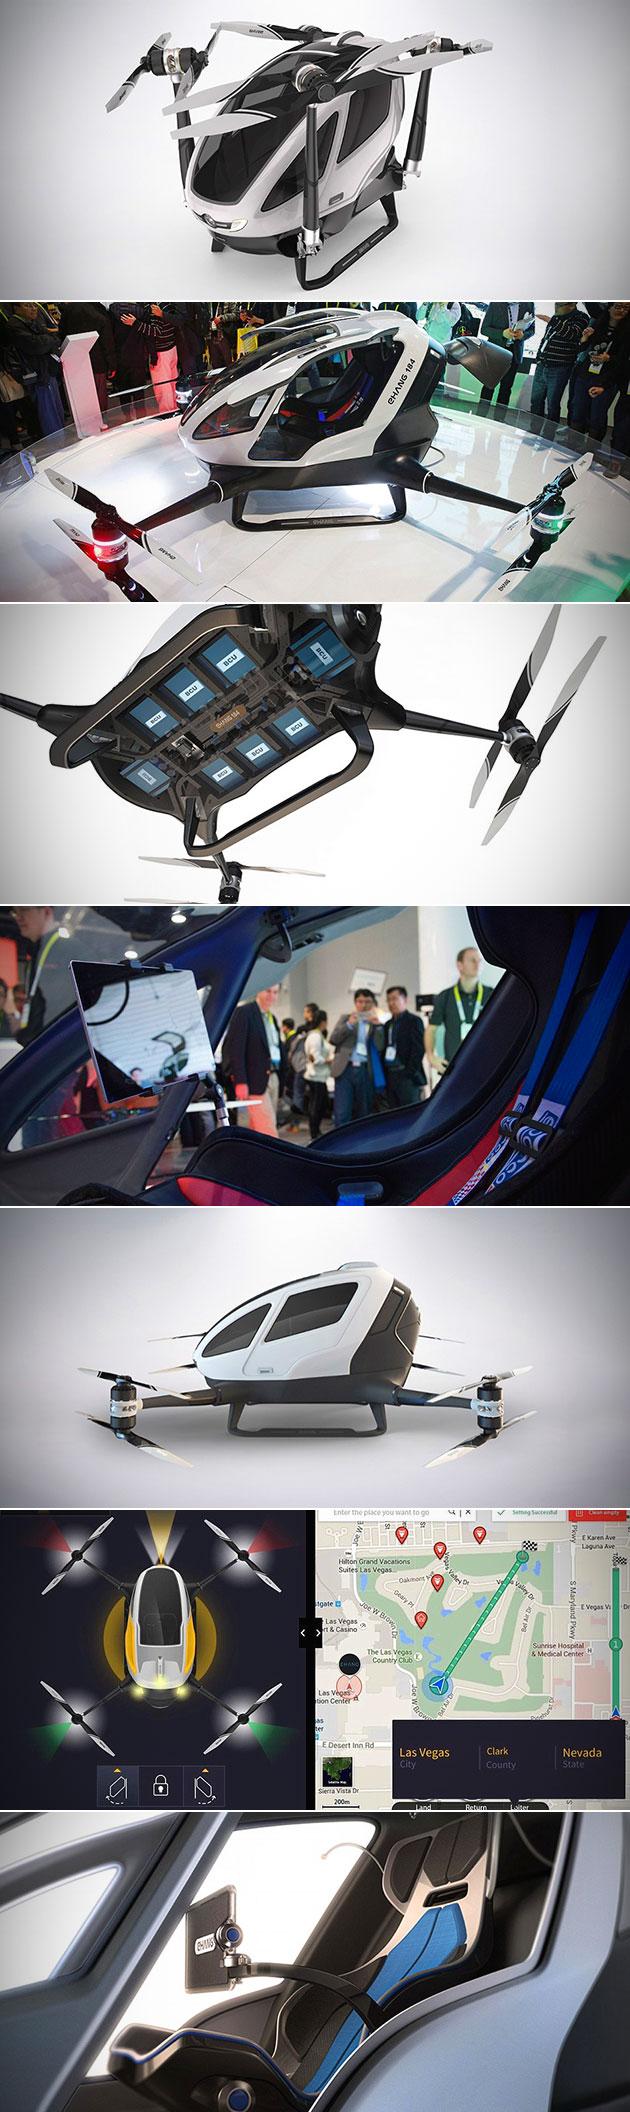 ehang 184 drone - Google Search